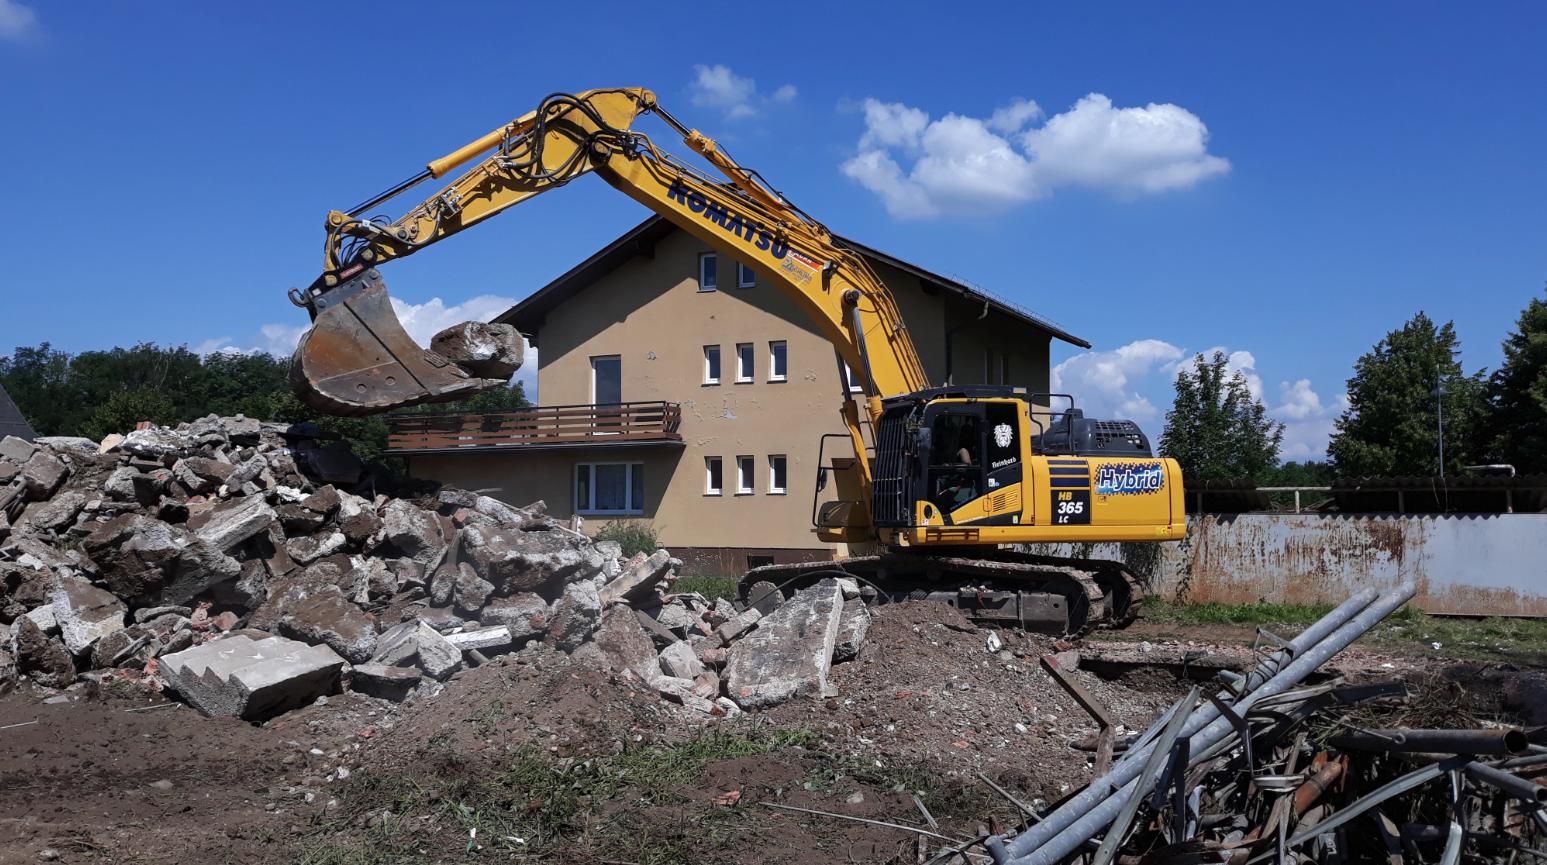 Foto: KUHN Baumaschinen GmbH